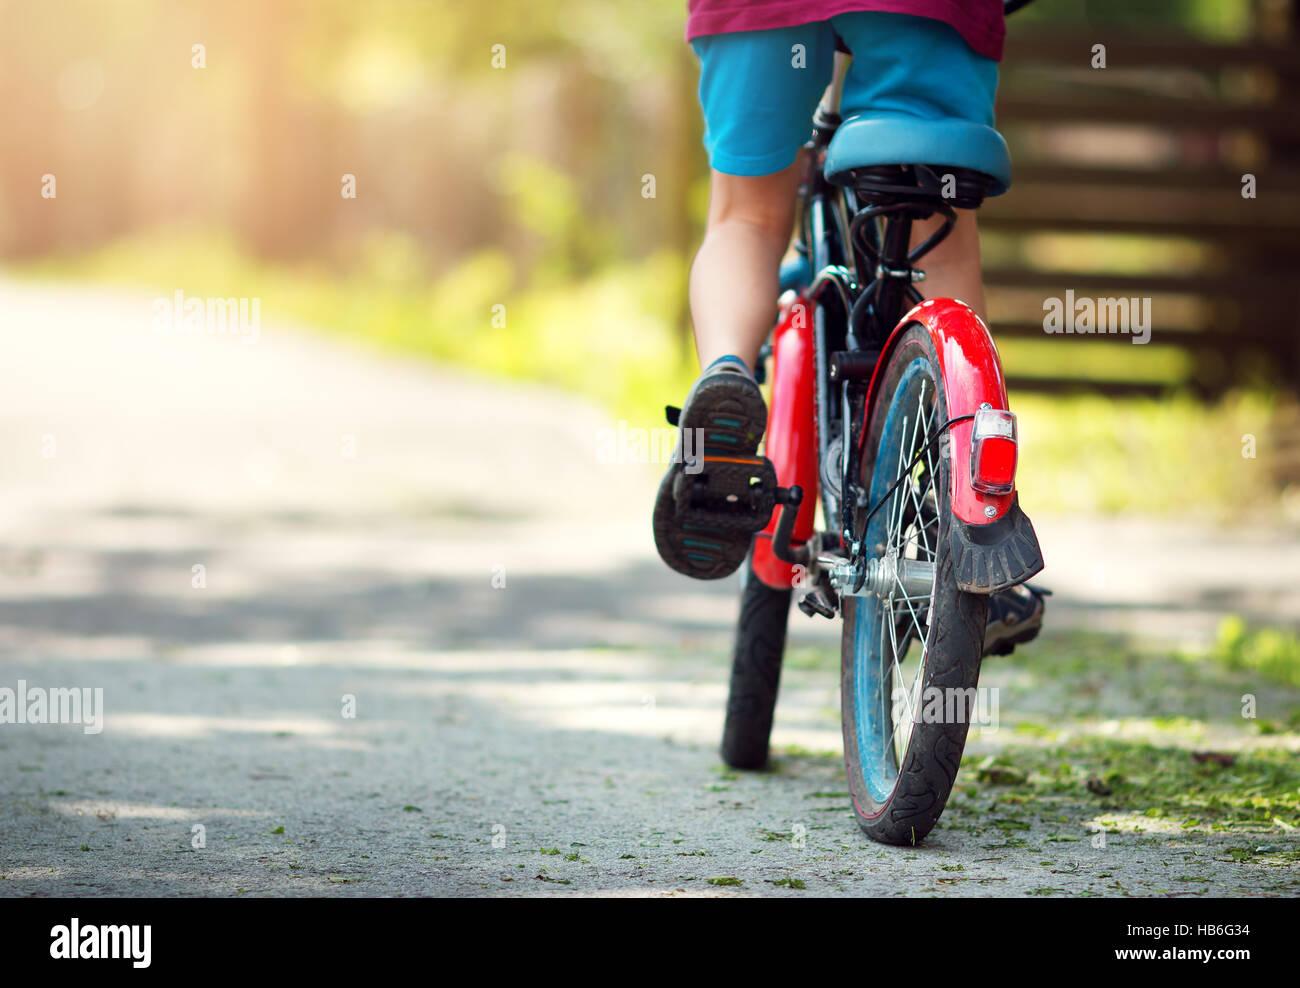 Niño en bicicleta Imagen De Stock